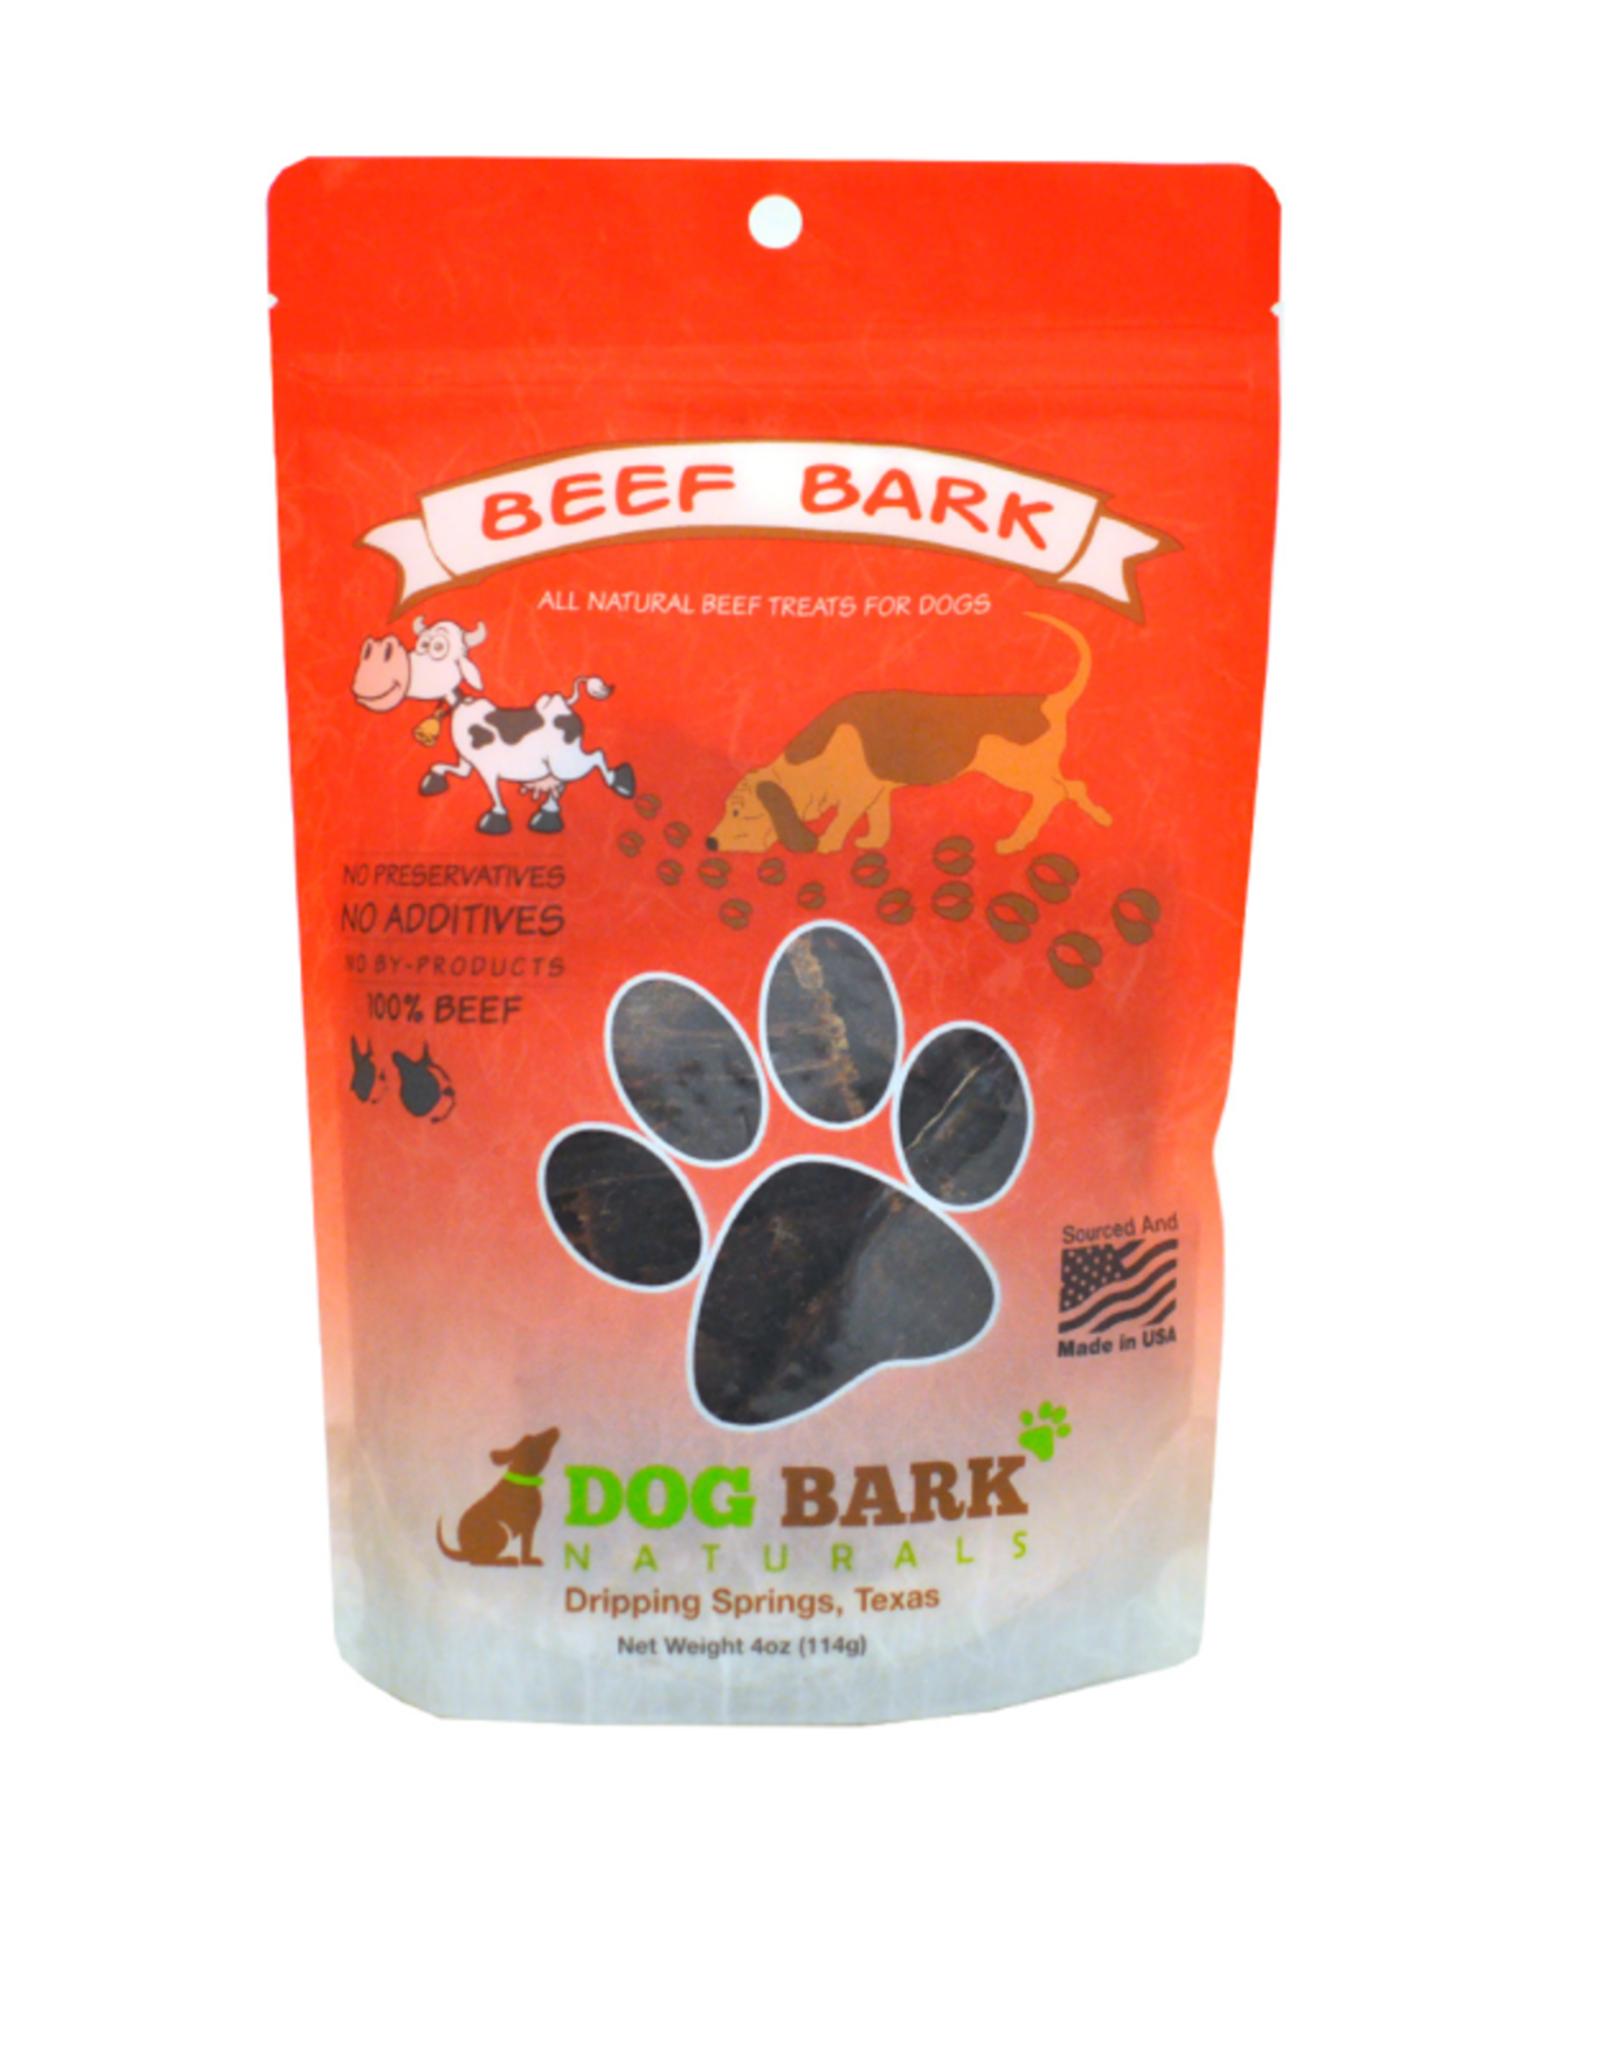 Dog Bark Naturals Beef Bark